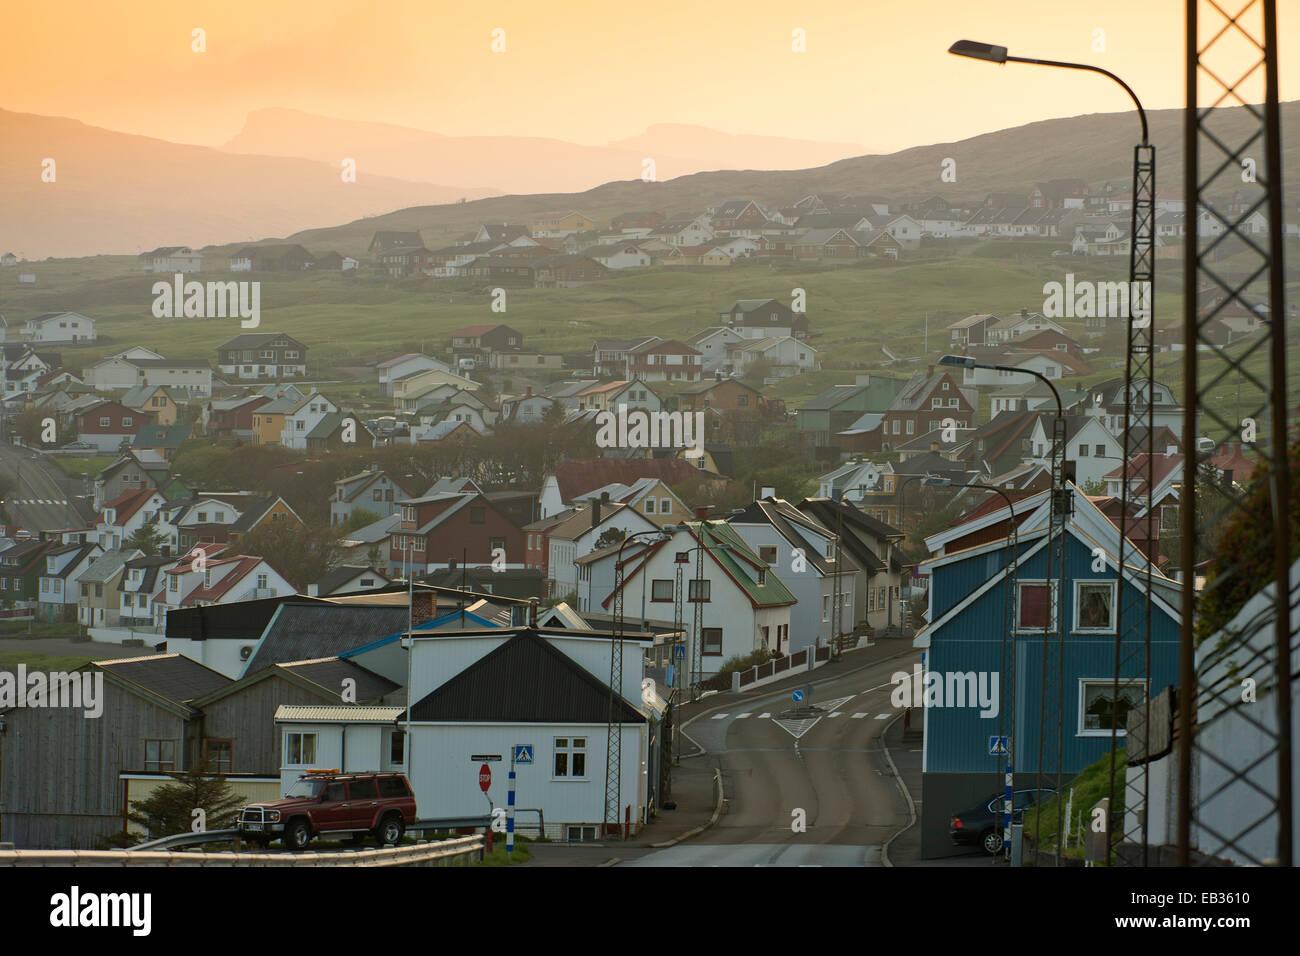 Centre of the town of Miðvágur, evening mood, Miðvágur, Vágar, Faroe Islands, Denmark - Stock Image